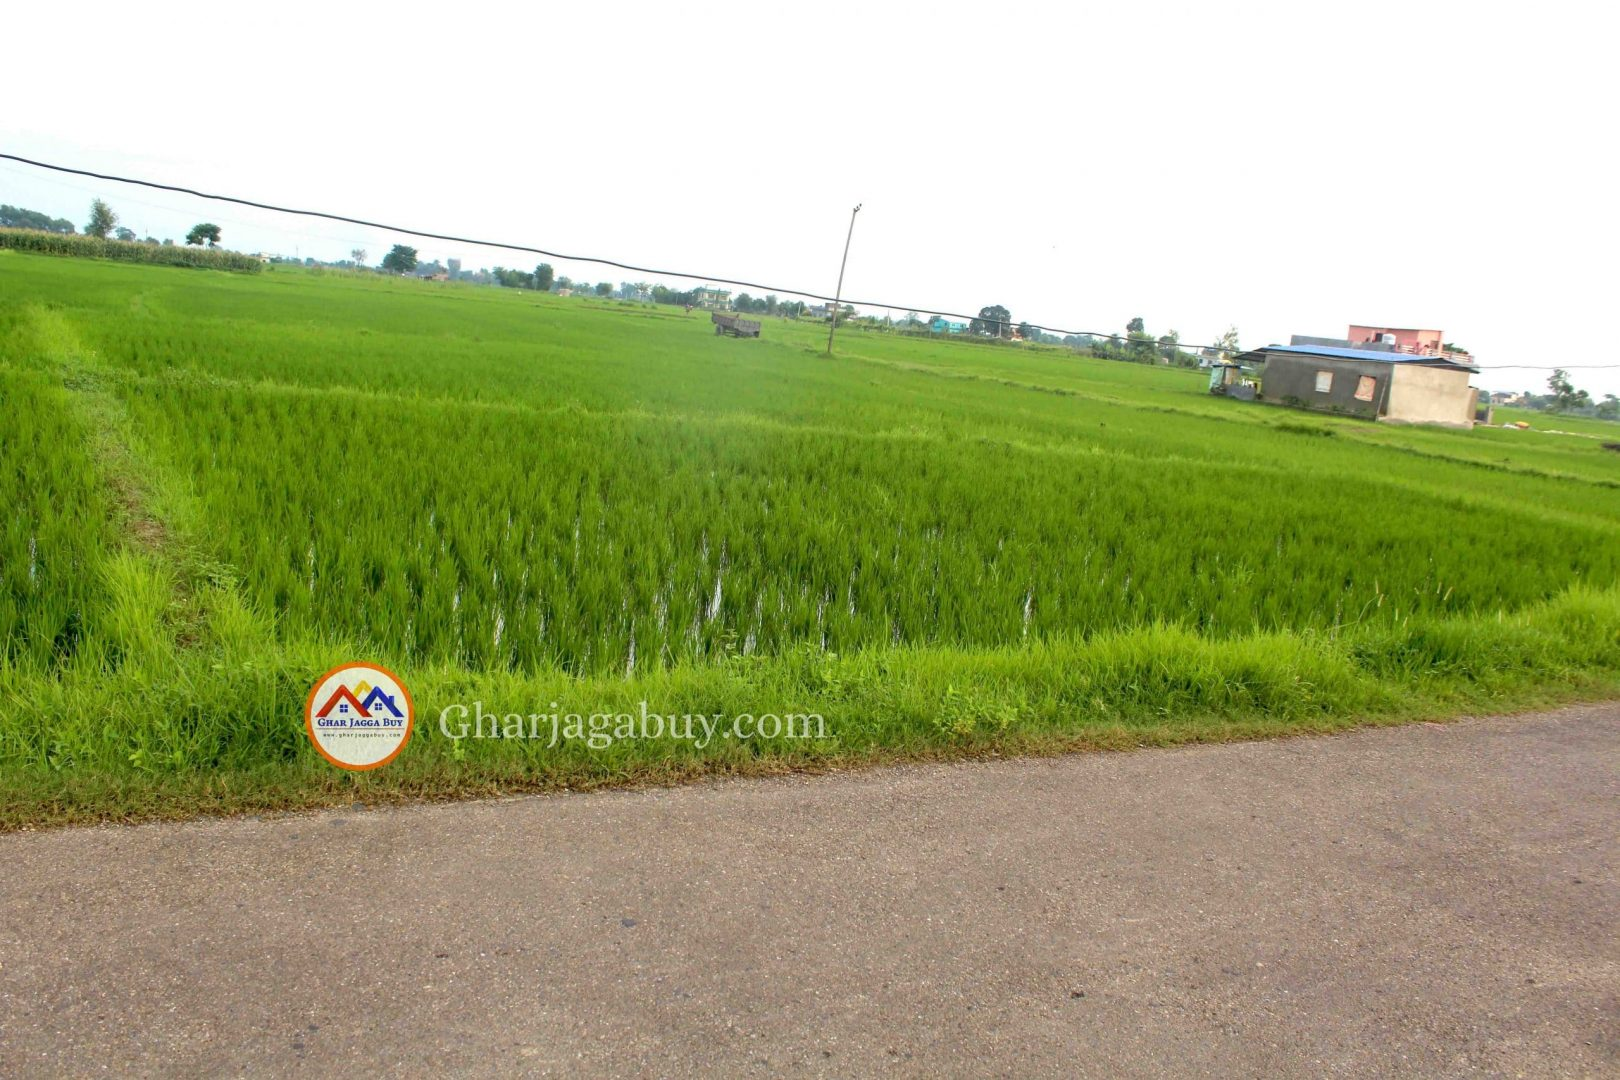 Cheap land for ghaderi is sale in Tilottama Rupandehi